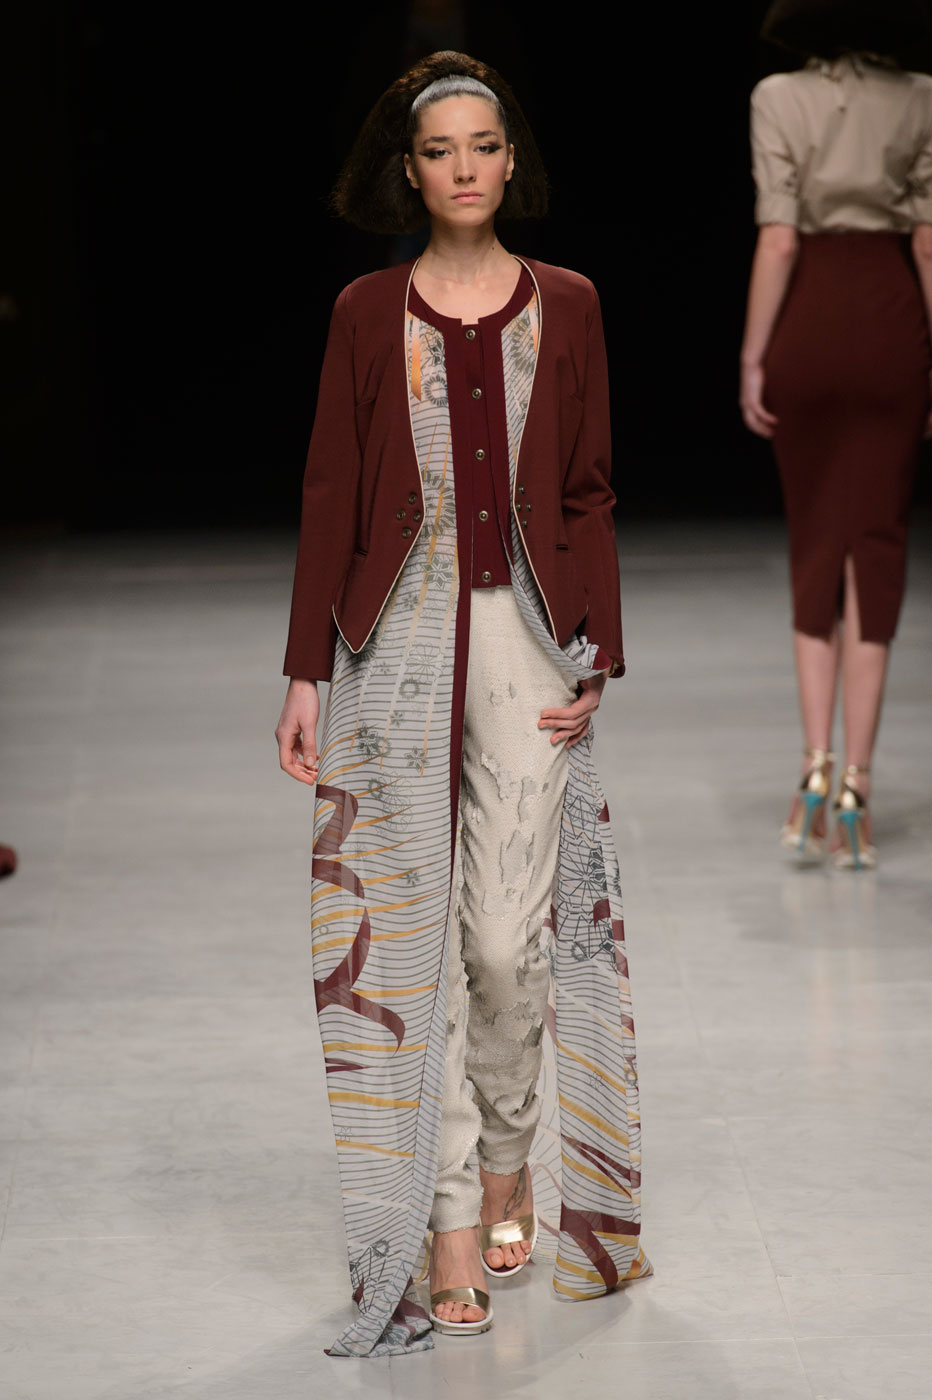 Julien-Fournie-Prive-fashion-runway-show-haute-couture-paris-spring-2015-the-impression-10